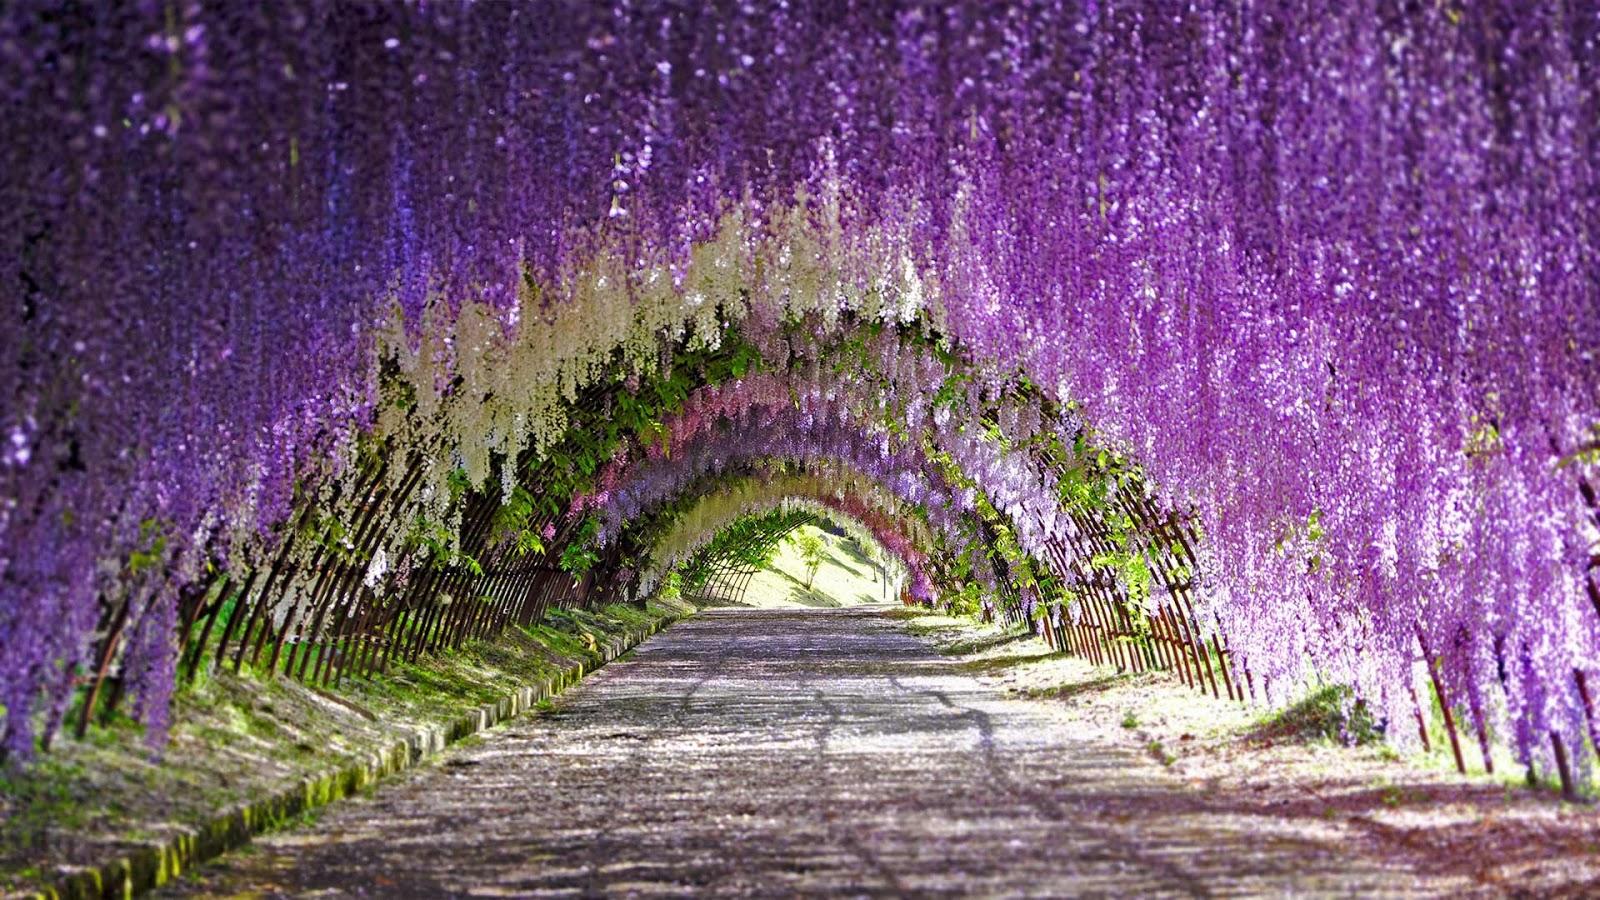 Wisteria blooms at Kawachi Fuji Gardens in Kitakyushu, Japan © Wibowo Rusli/Alamy